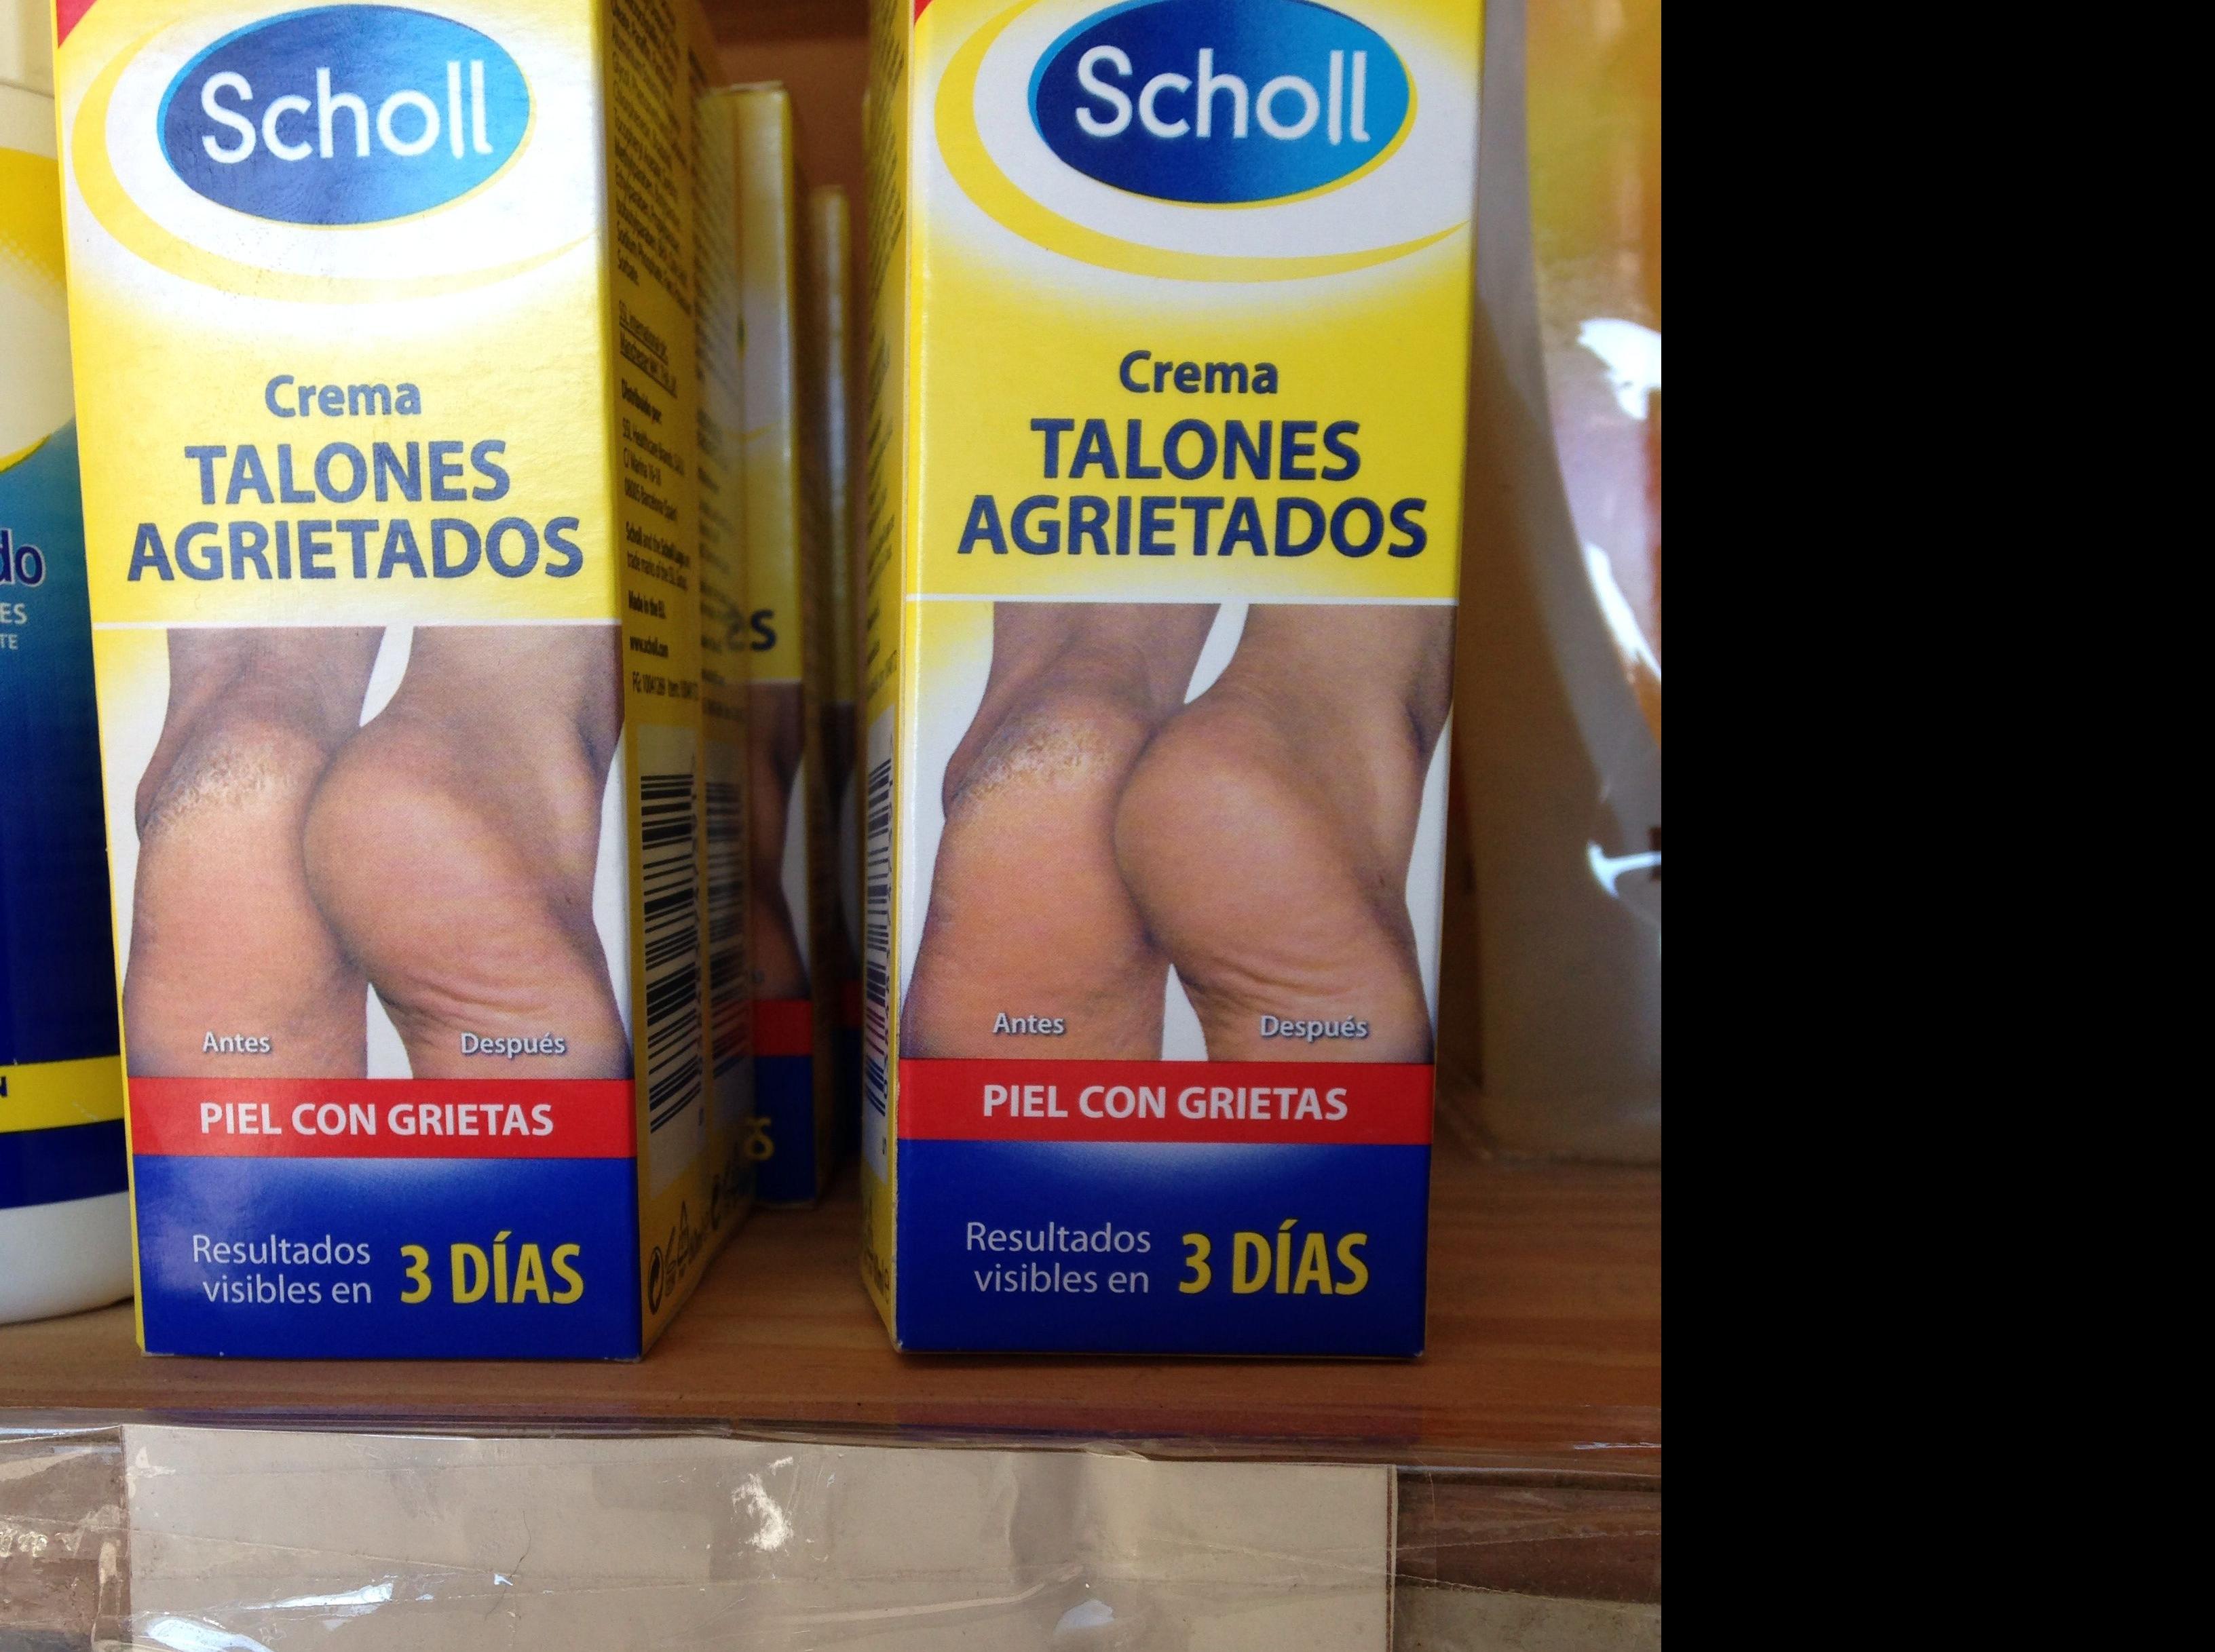 Scholl talones